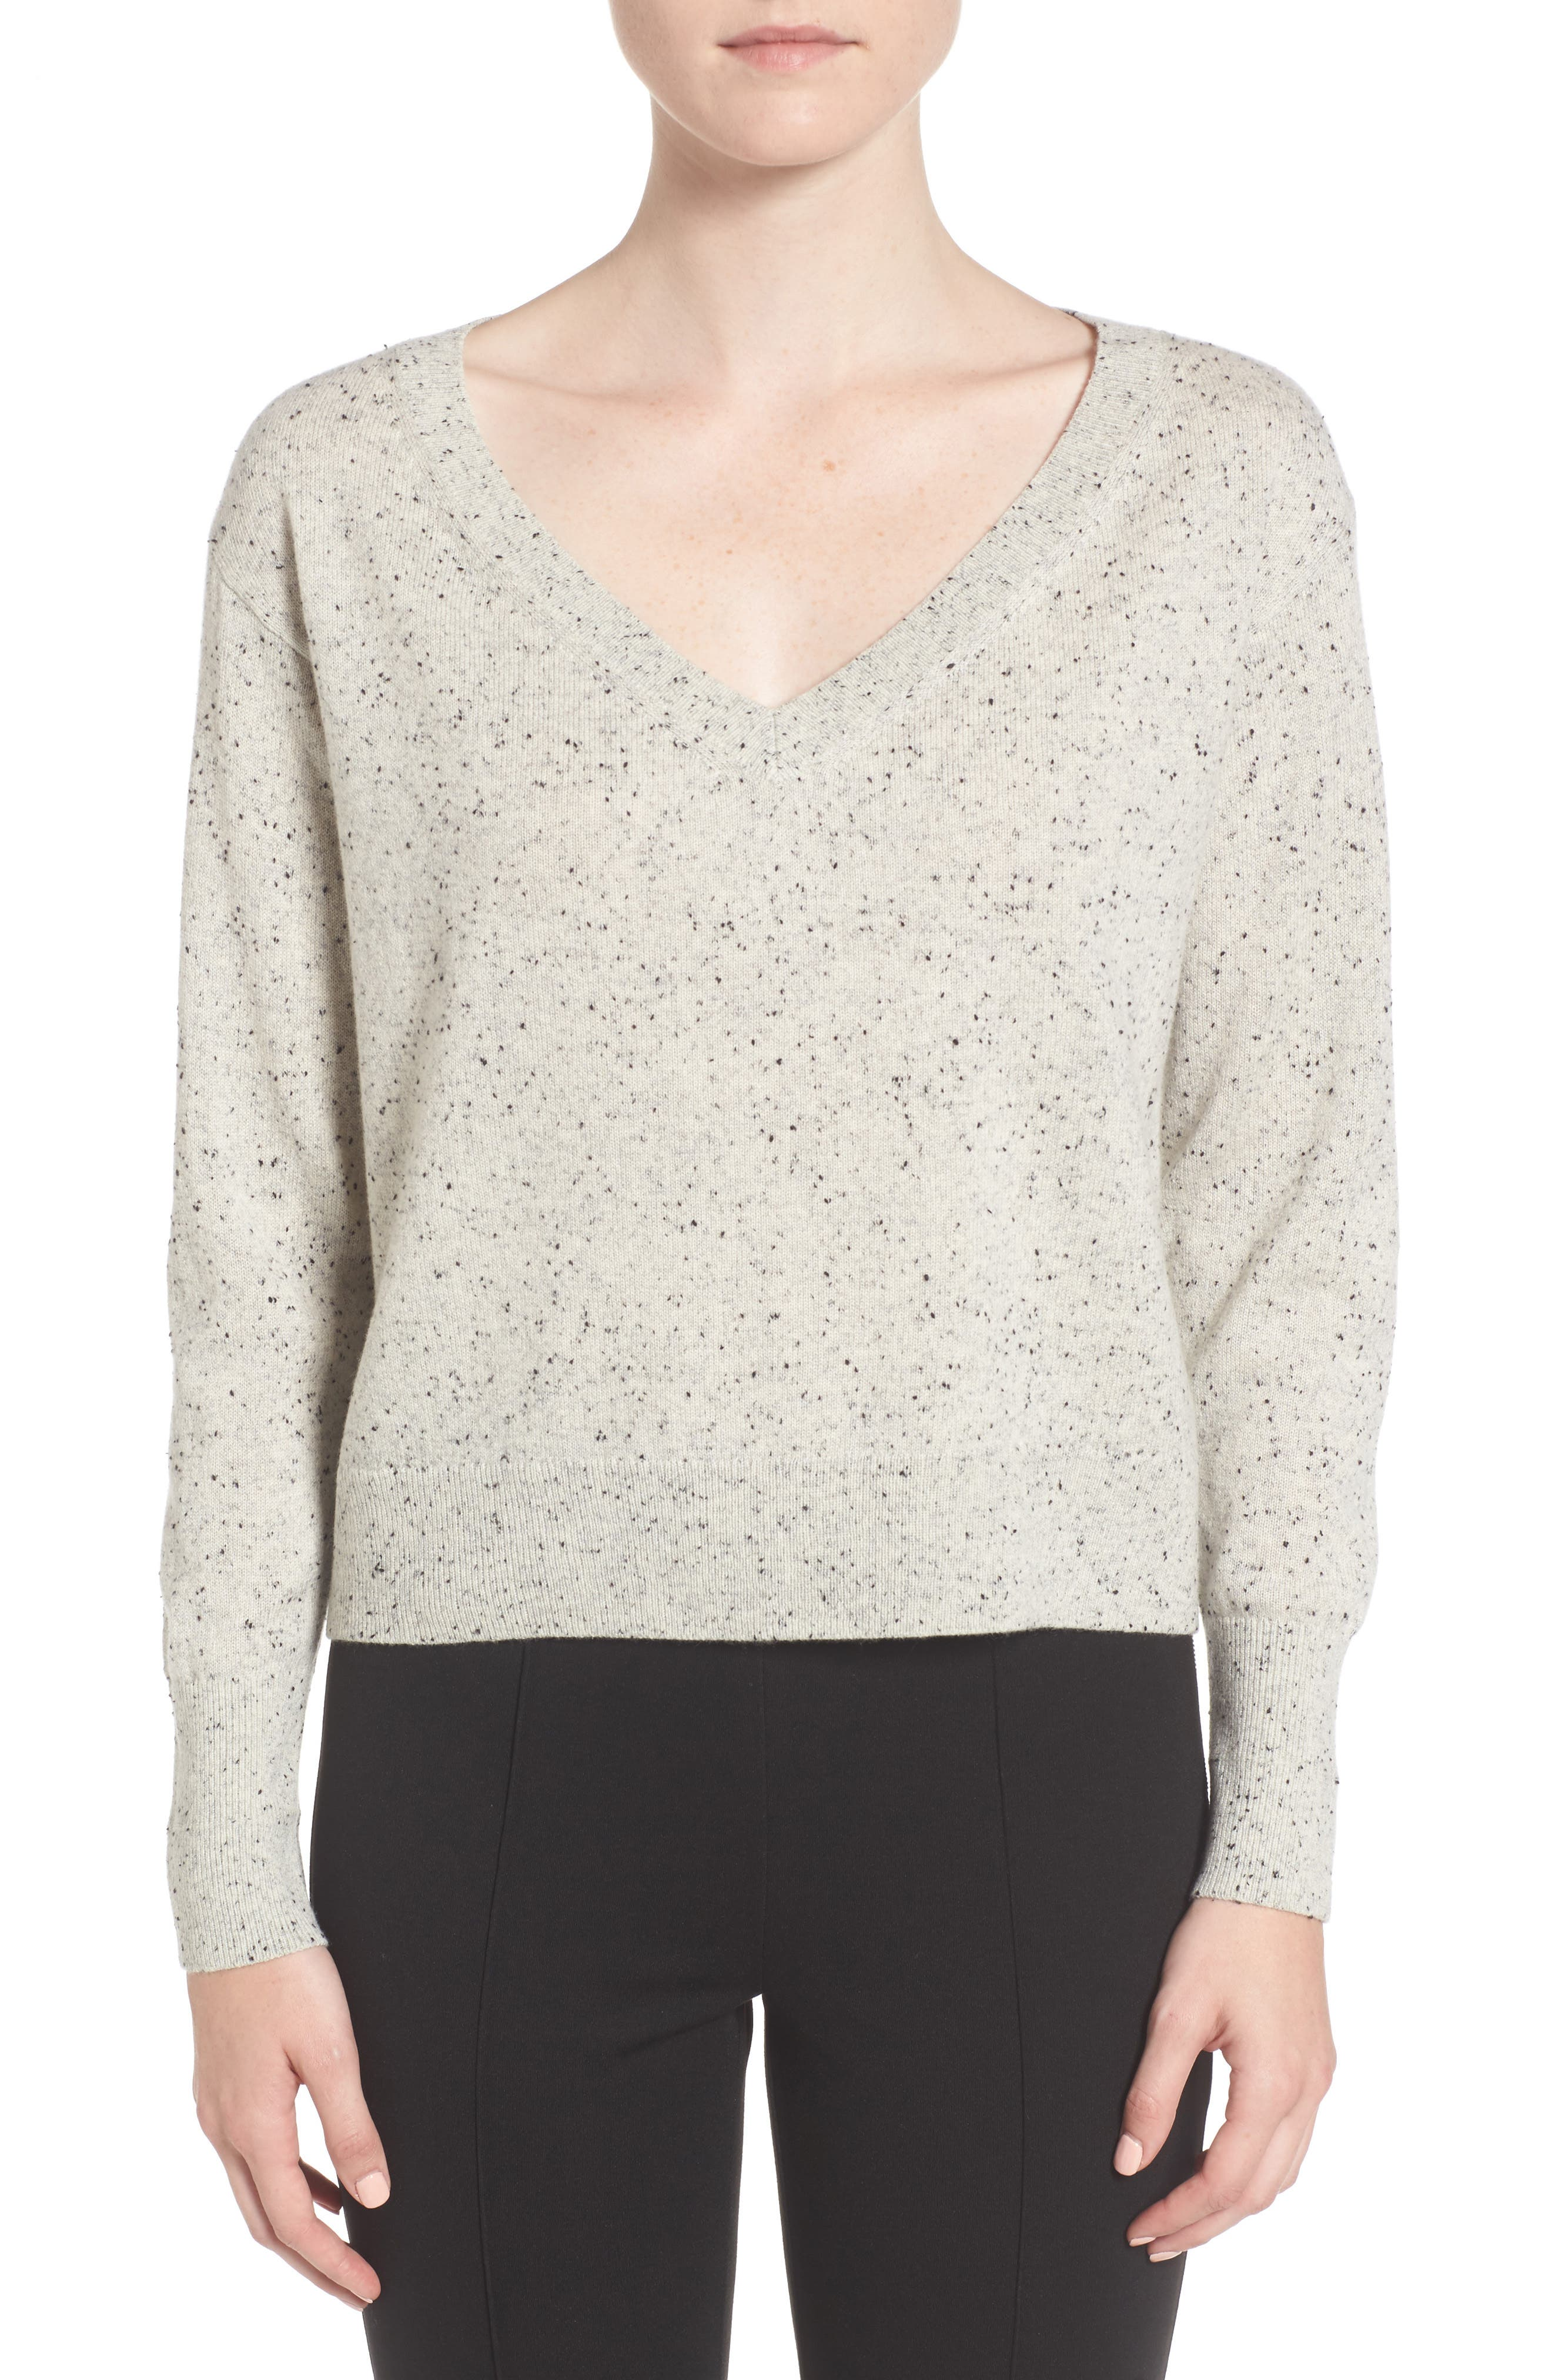 Everlane The Cashmere Crop V-Neck Sweater